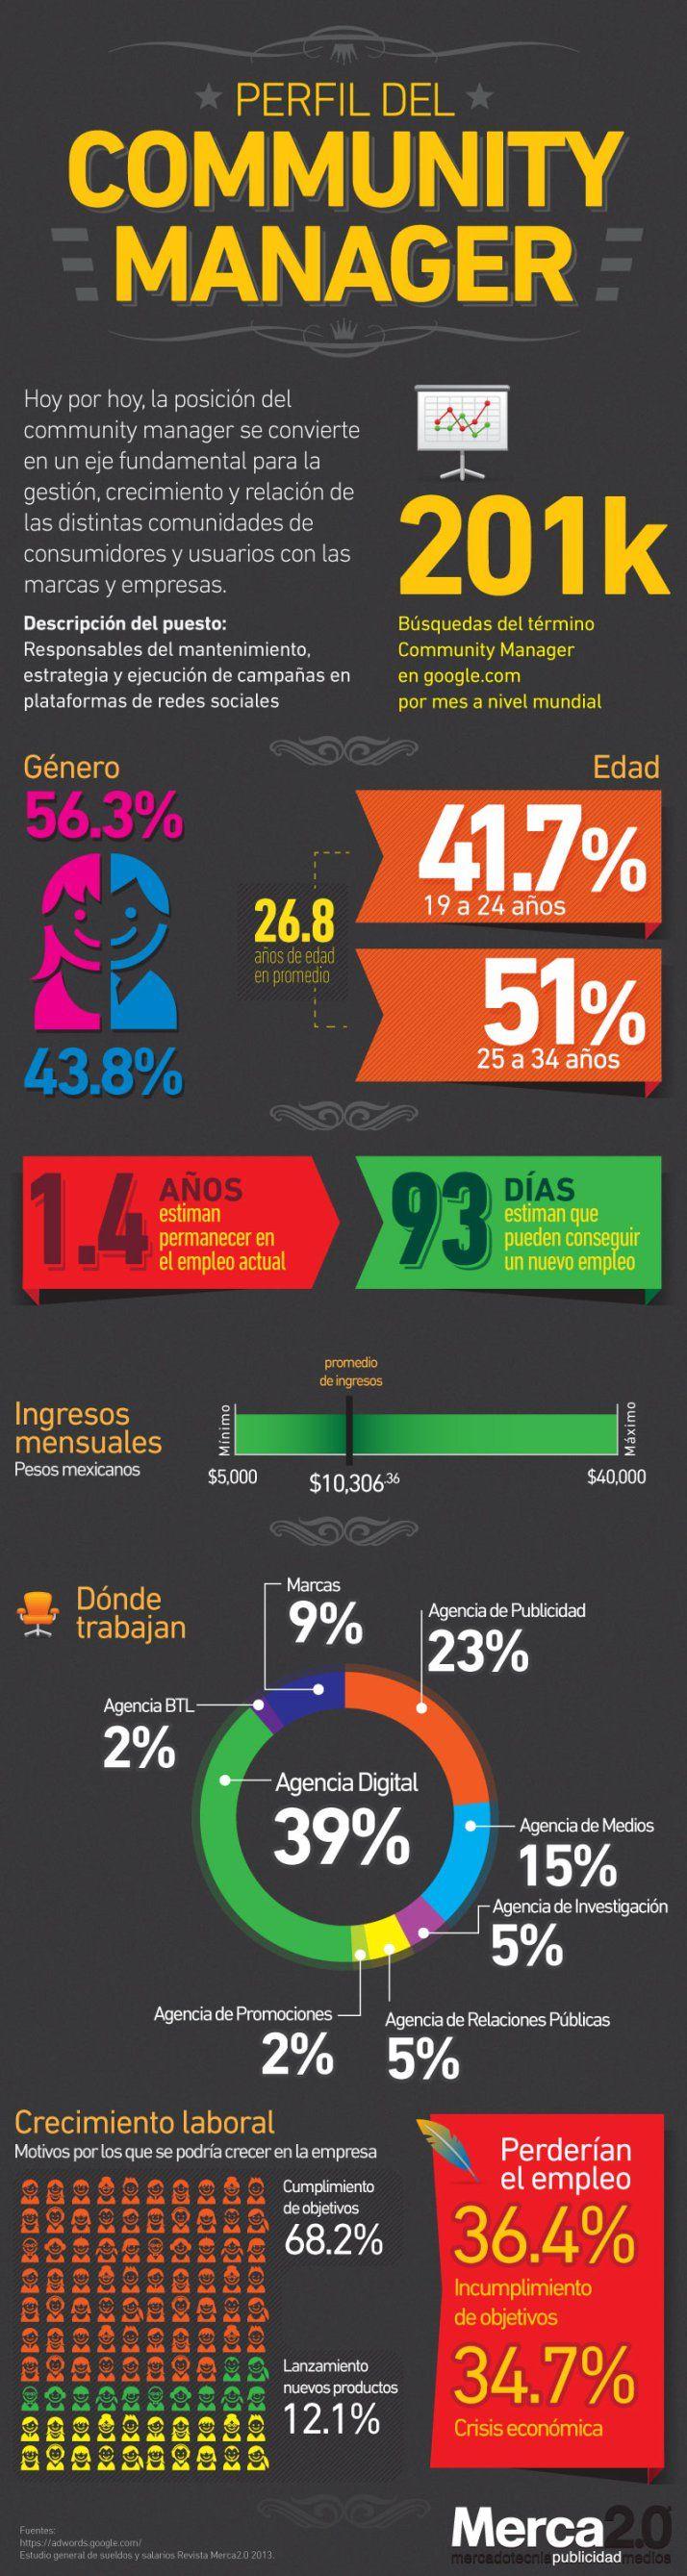 Perfil del Community Manager en Latinoamérica #Infografia #SocialMedia #CommunityManager